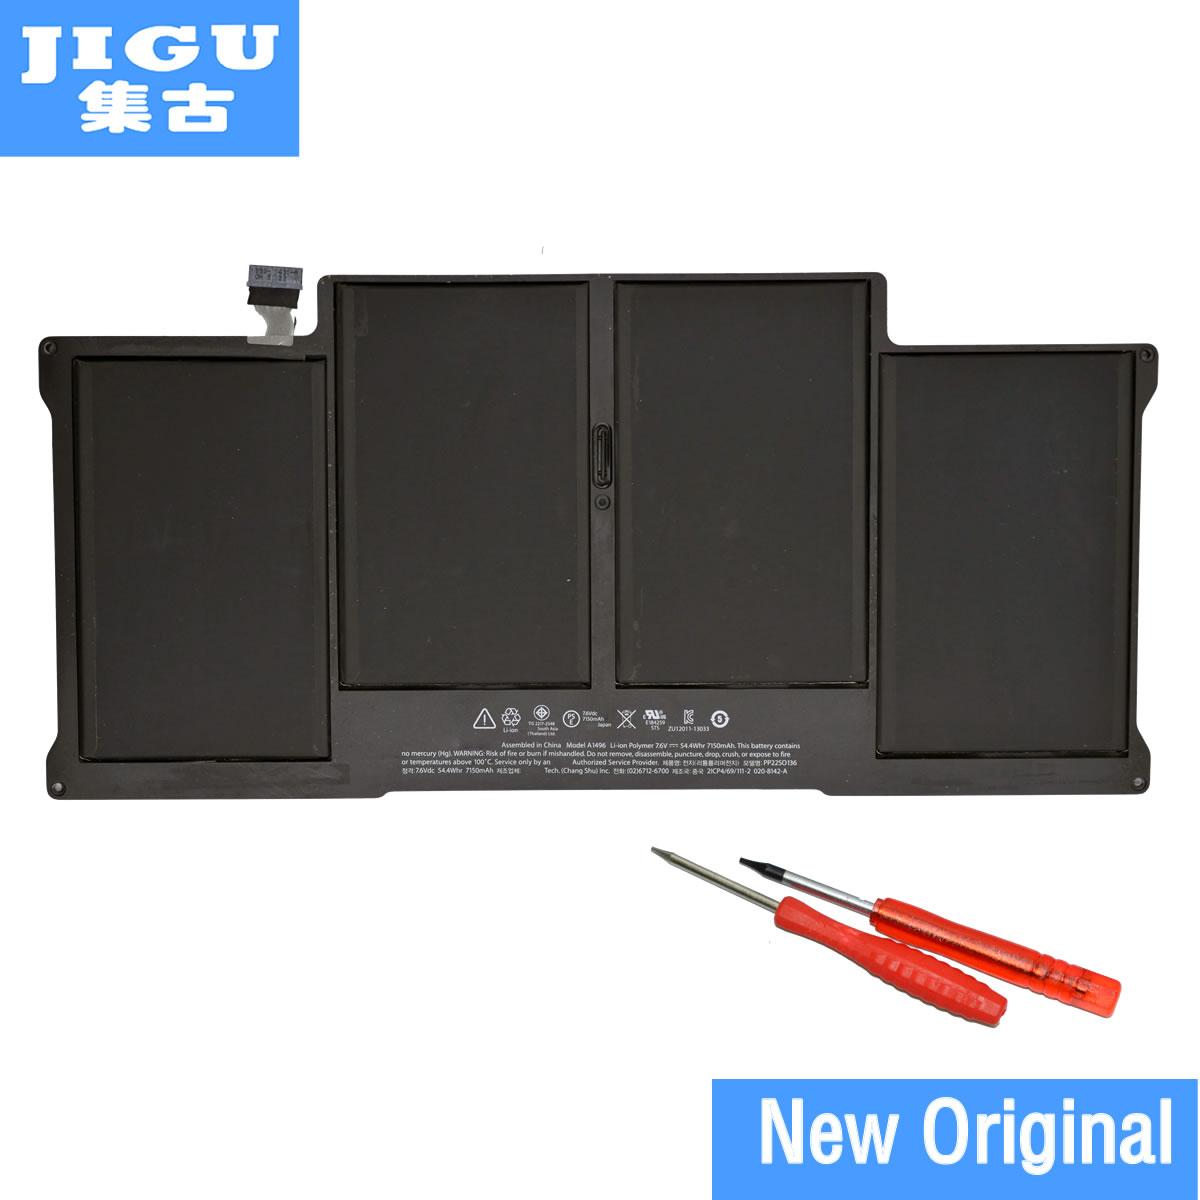 JIGU Бесплатная доставка A1496 оригинальный ноутбук Батарея для APPLE MacBook Air 13 A1466 2013/2014 MD760LL/MD761CH /7,6 В 7150 мАч